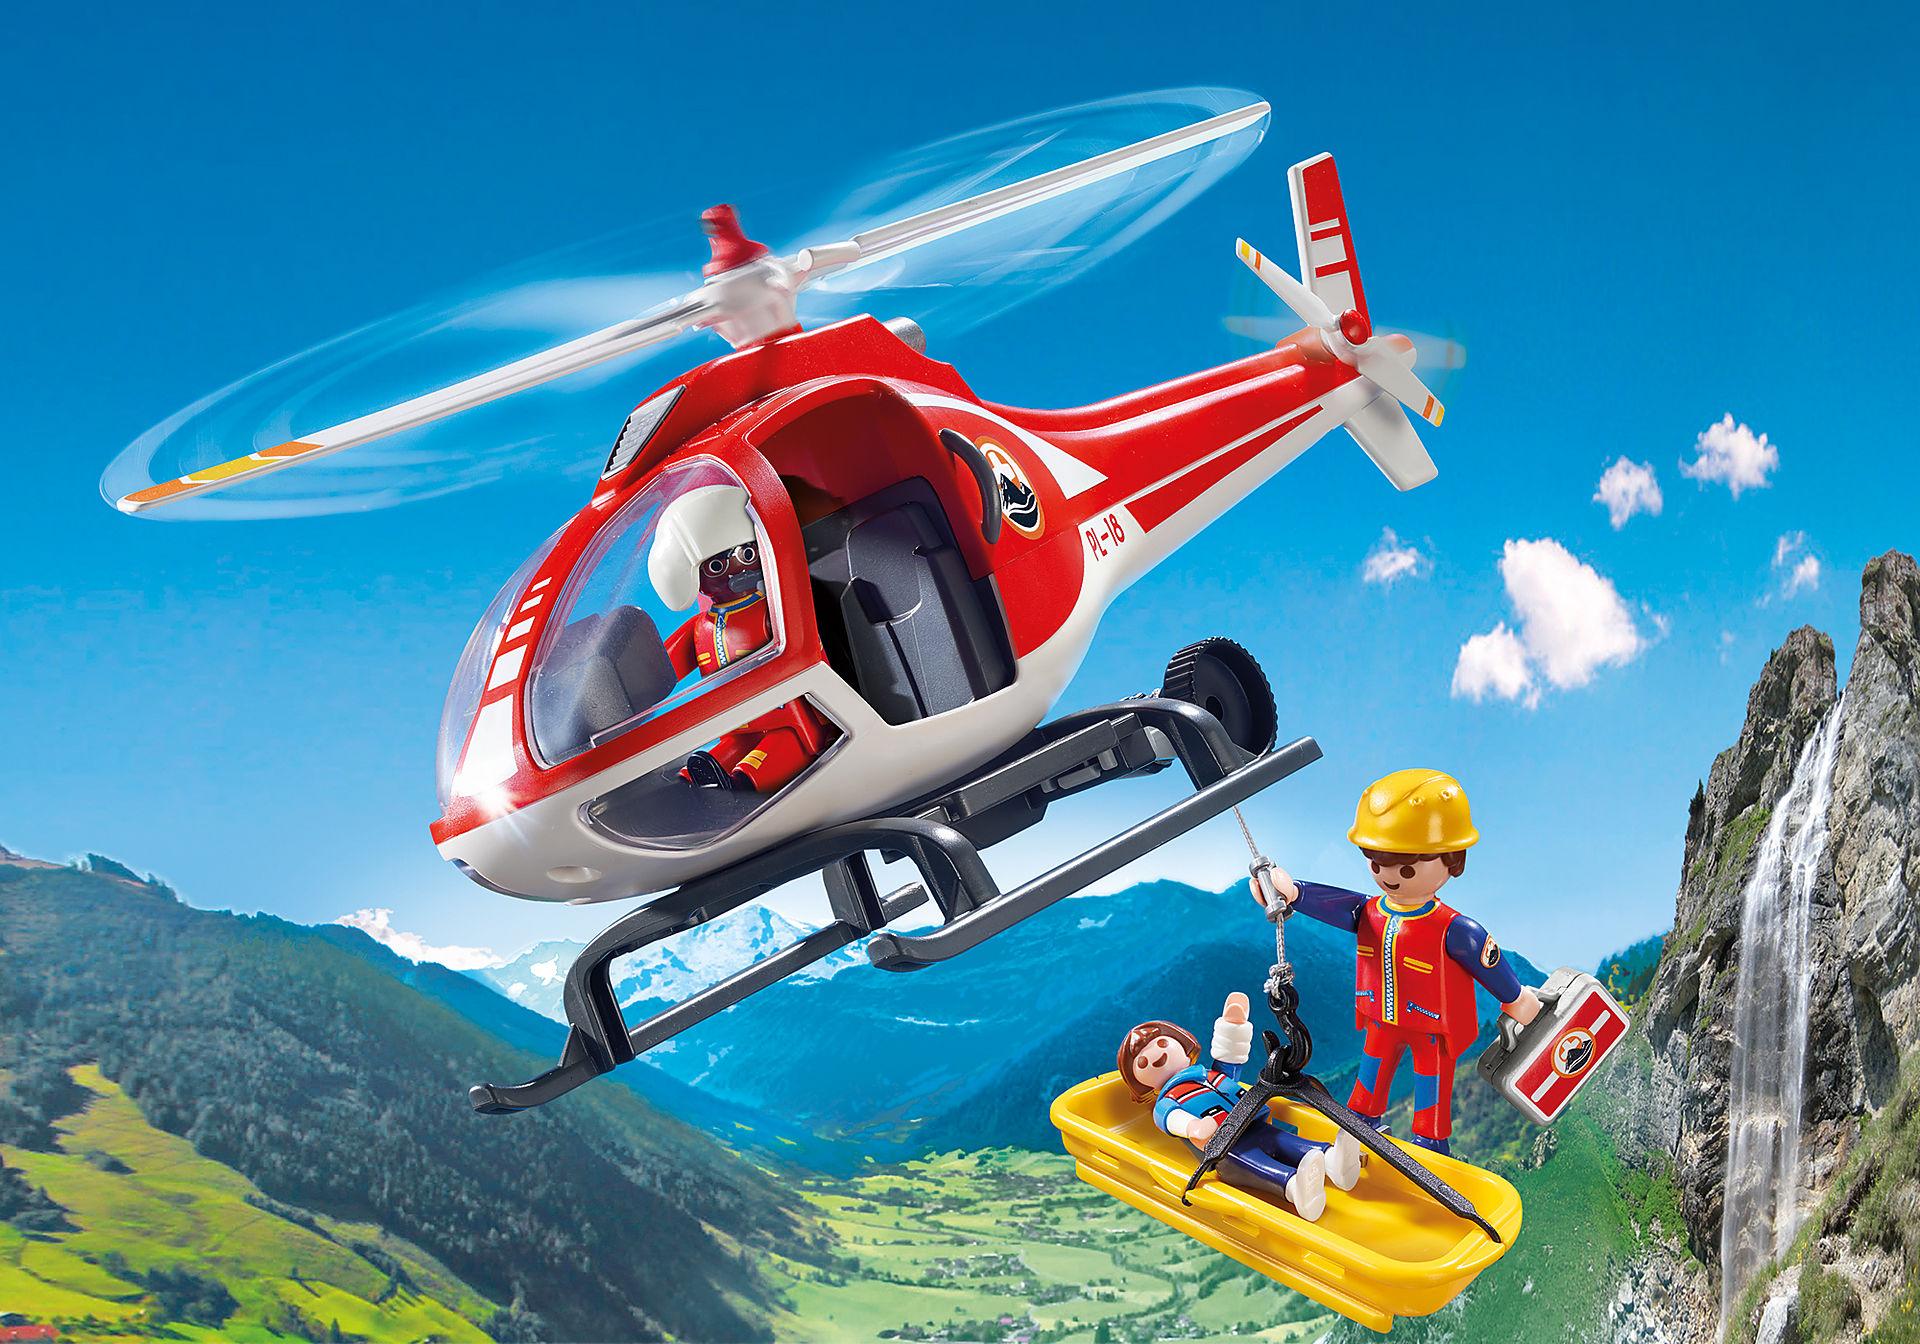 http://media.playmobil.com/i/playmobil/9127_product_detail/Reddingswerkers met helikopter